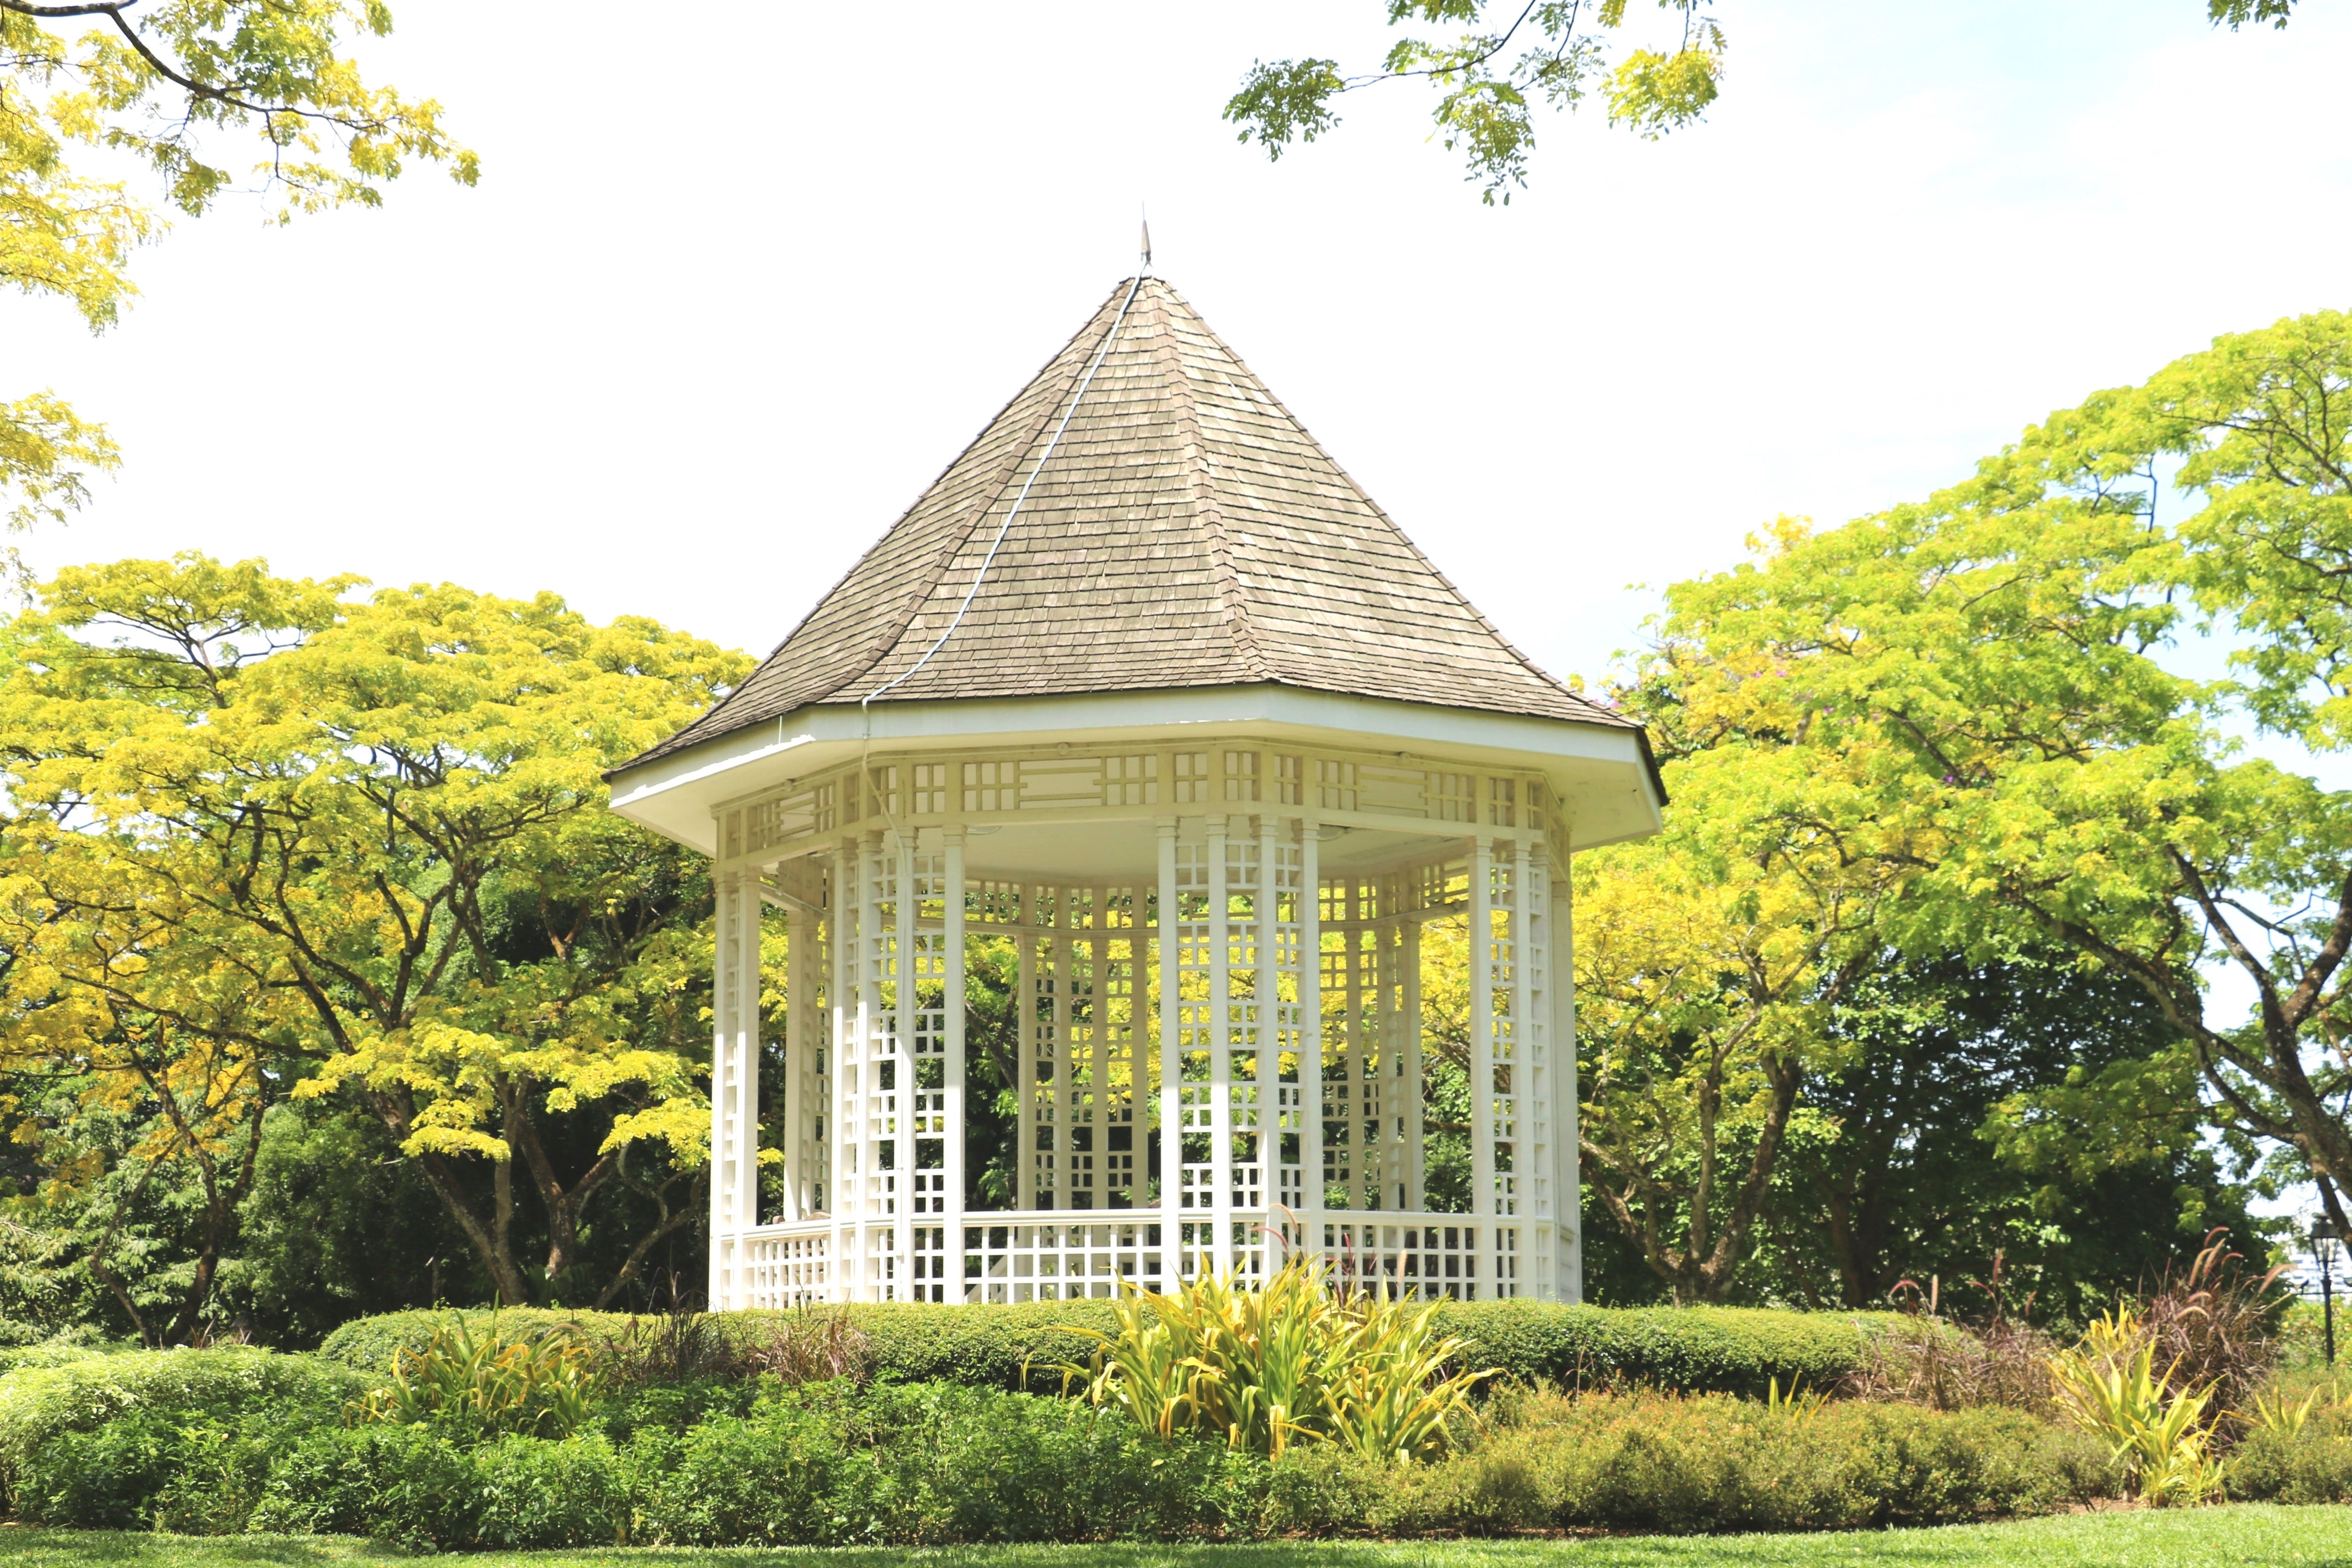 921ead258968bd5357efa9708158c437 - Best Places To Stay Near Kew Gardens